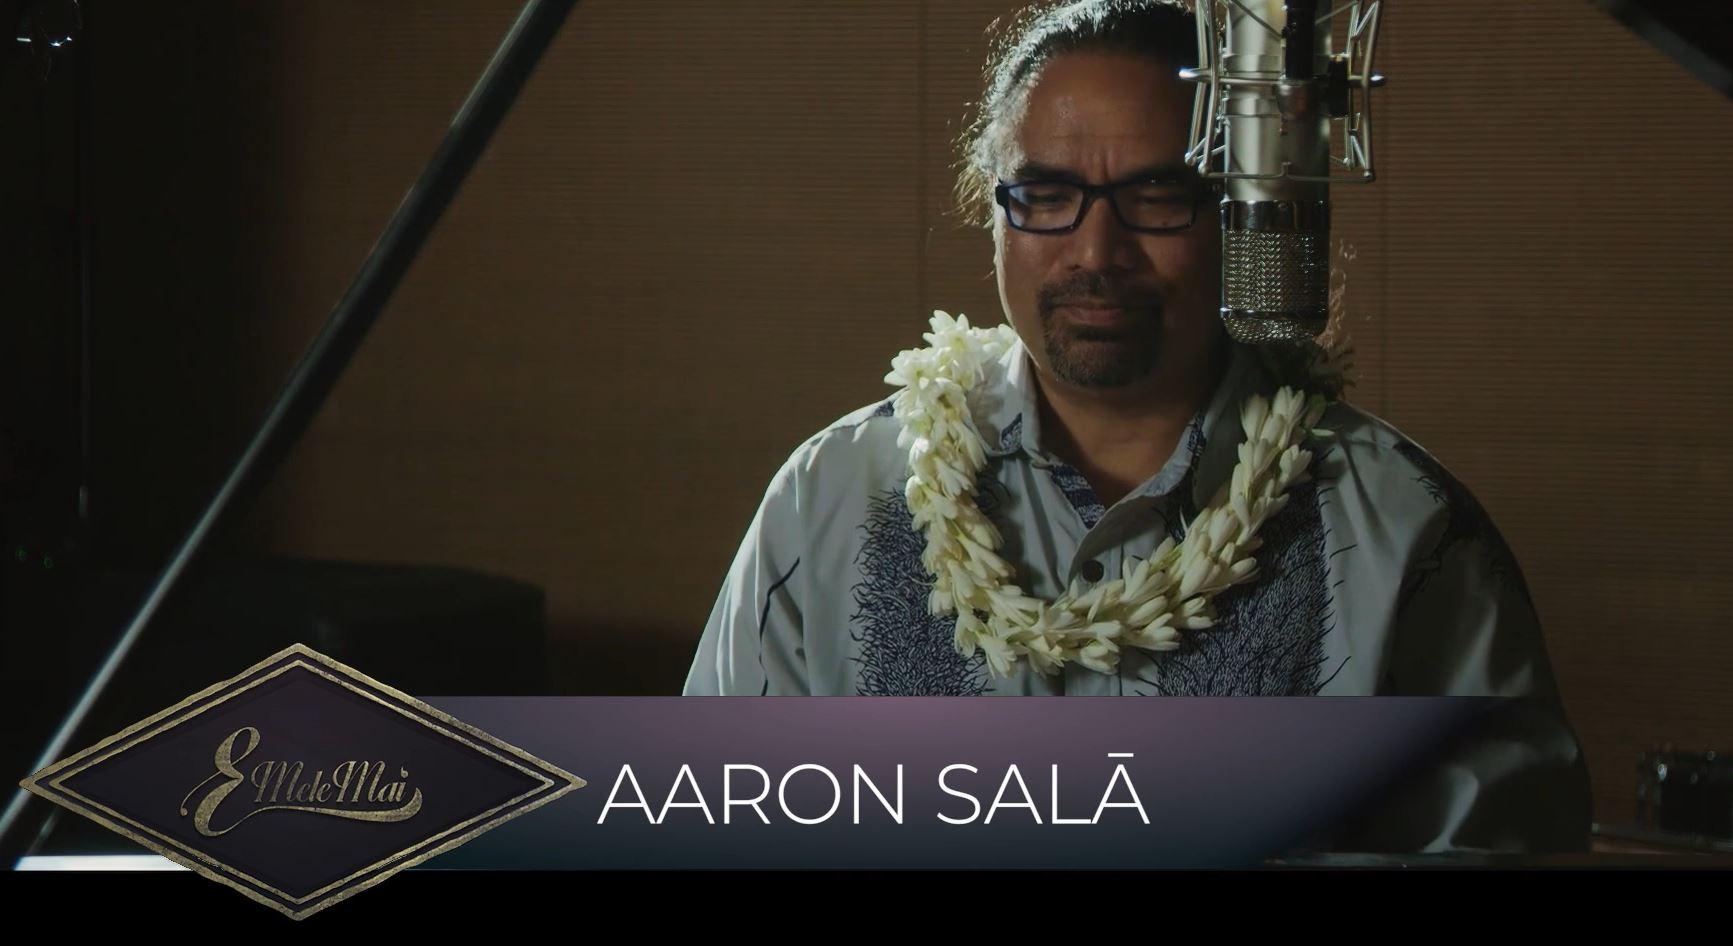 Aaron Salā メインビジュアル